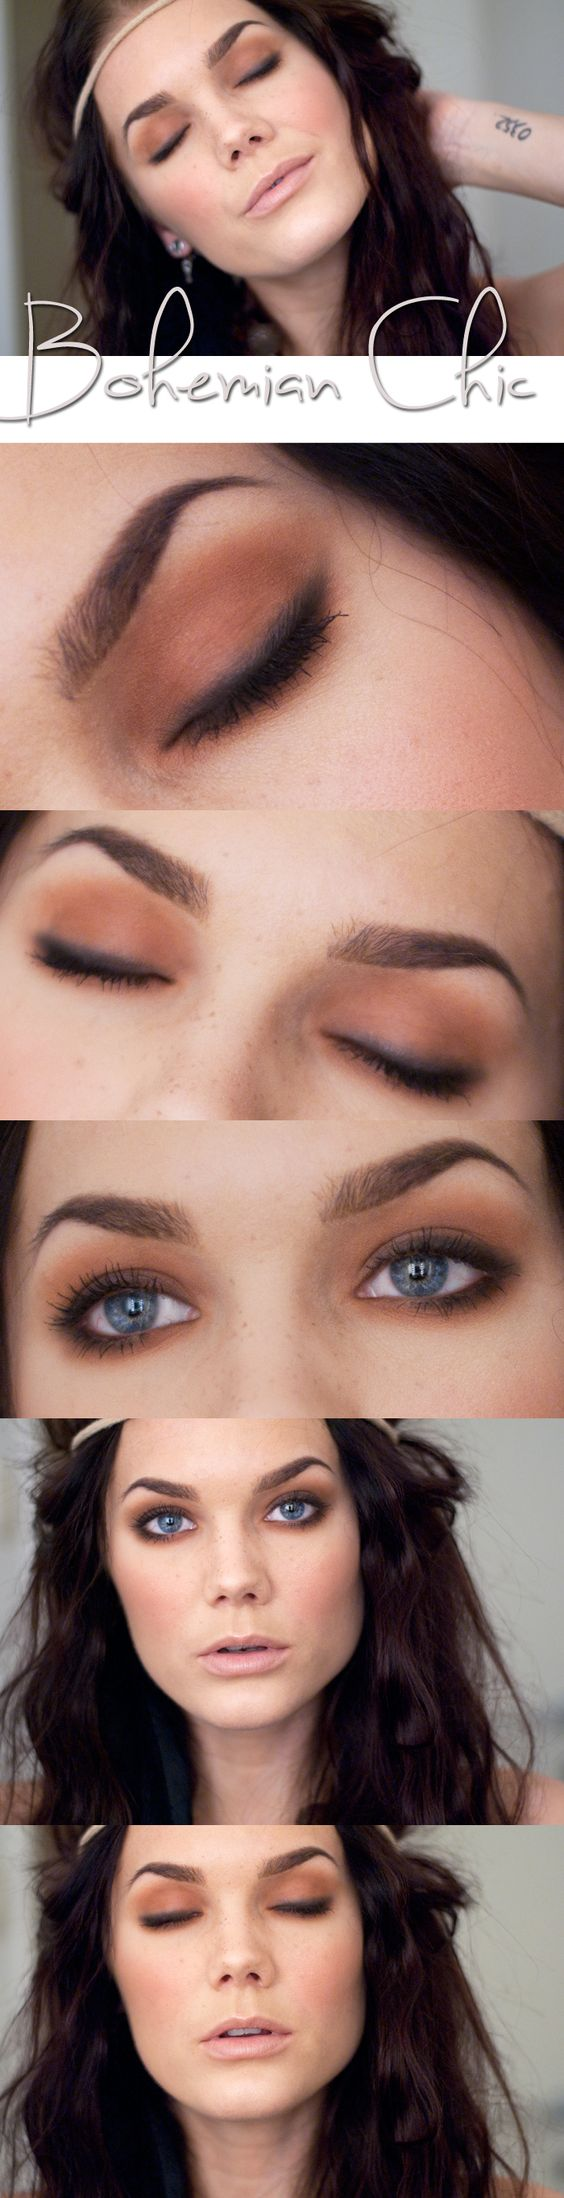 Bohemian look. She used an eyepencil to create fake freckles - Linda Hallberg